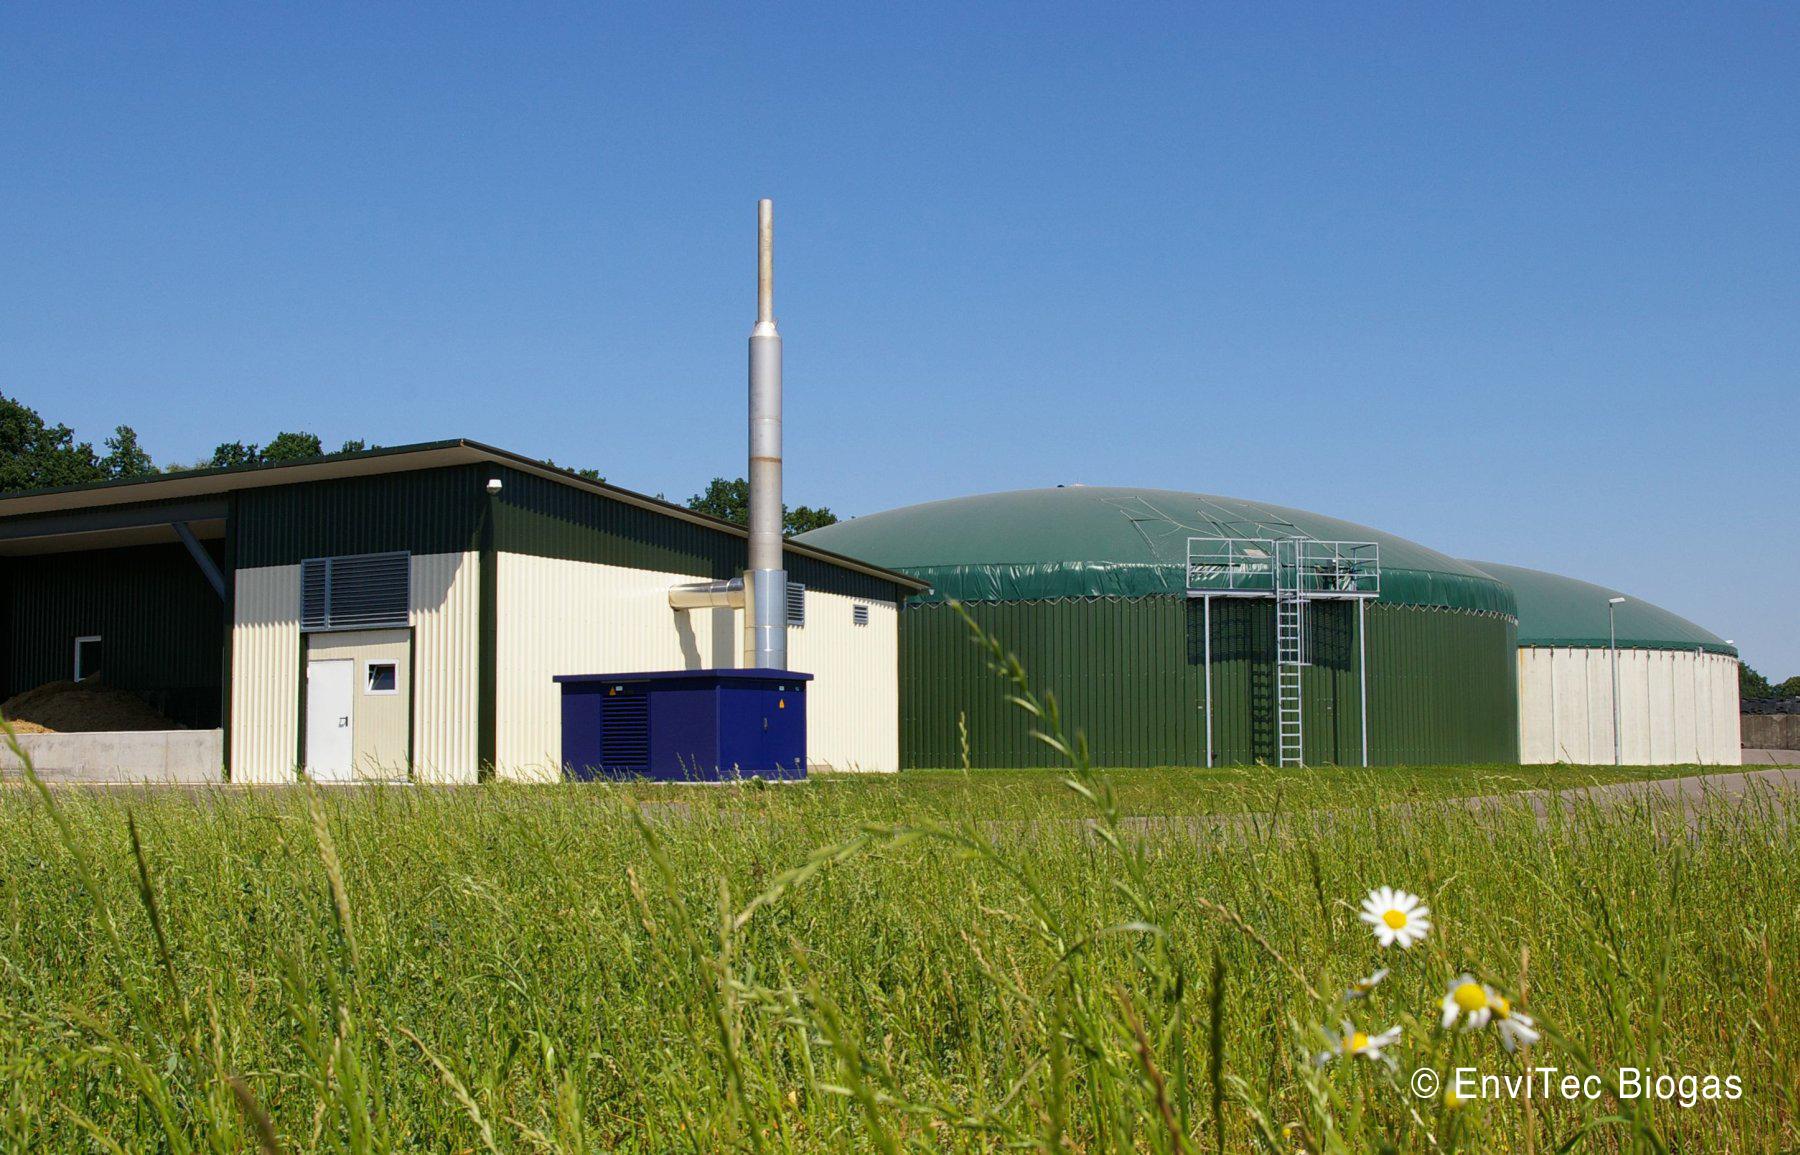 © Envitec Biogas